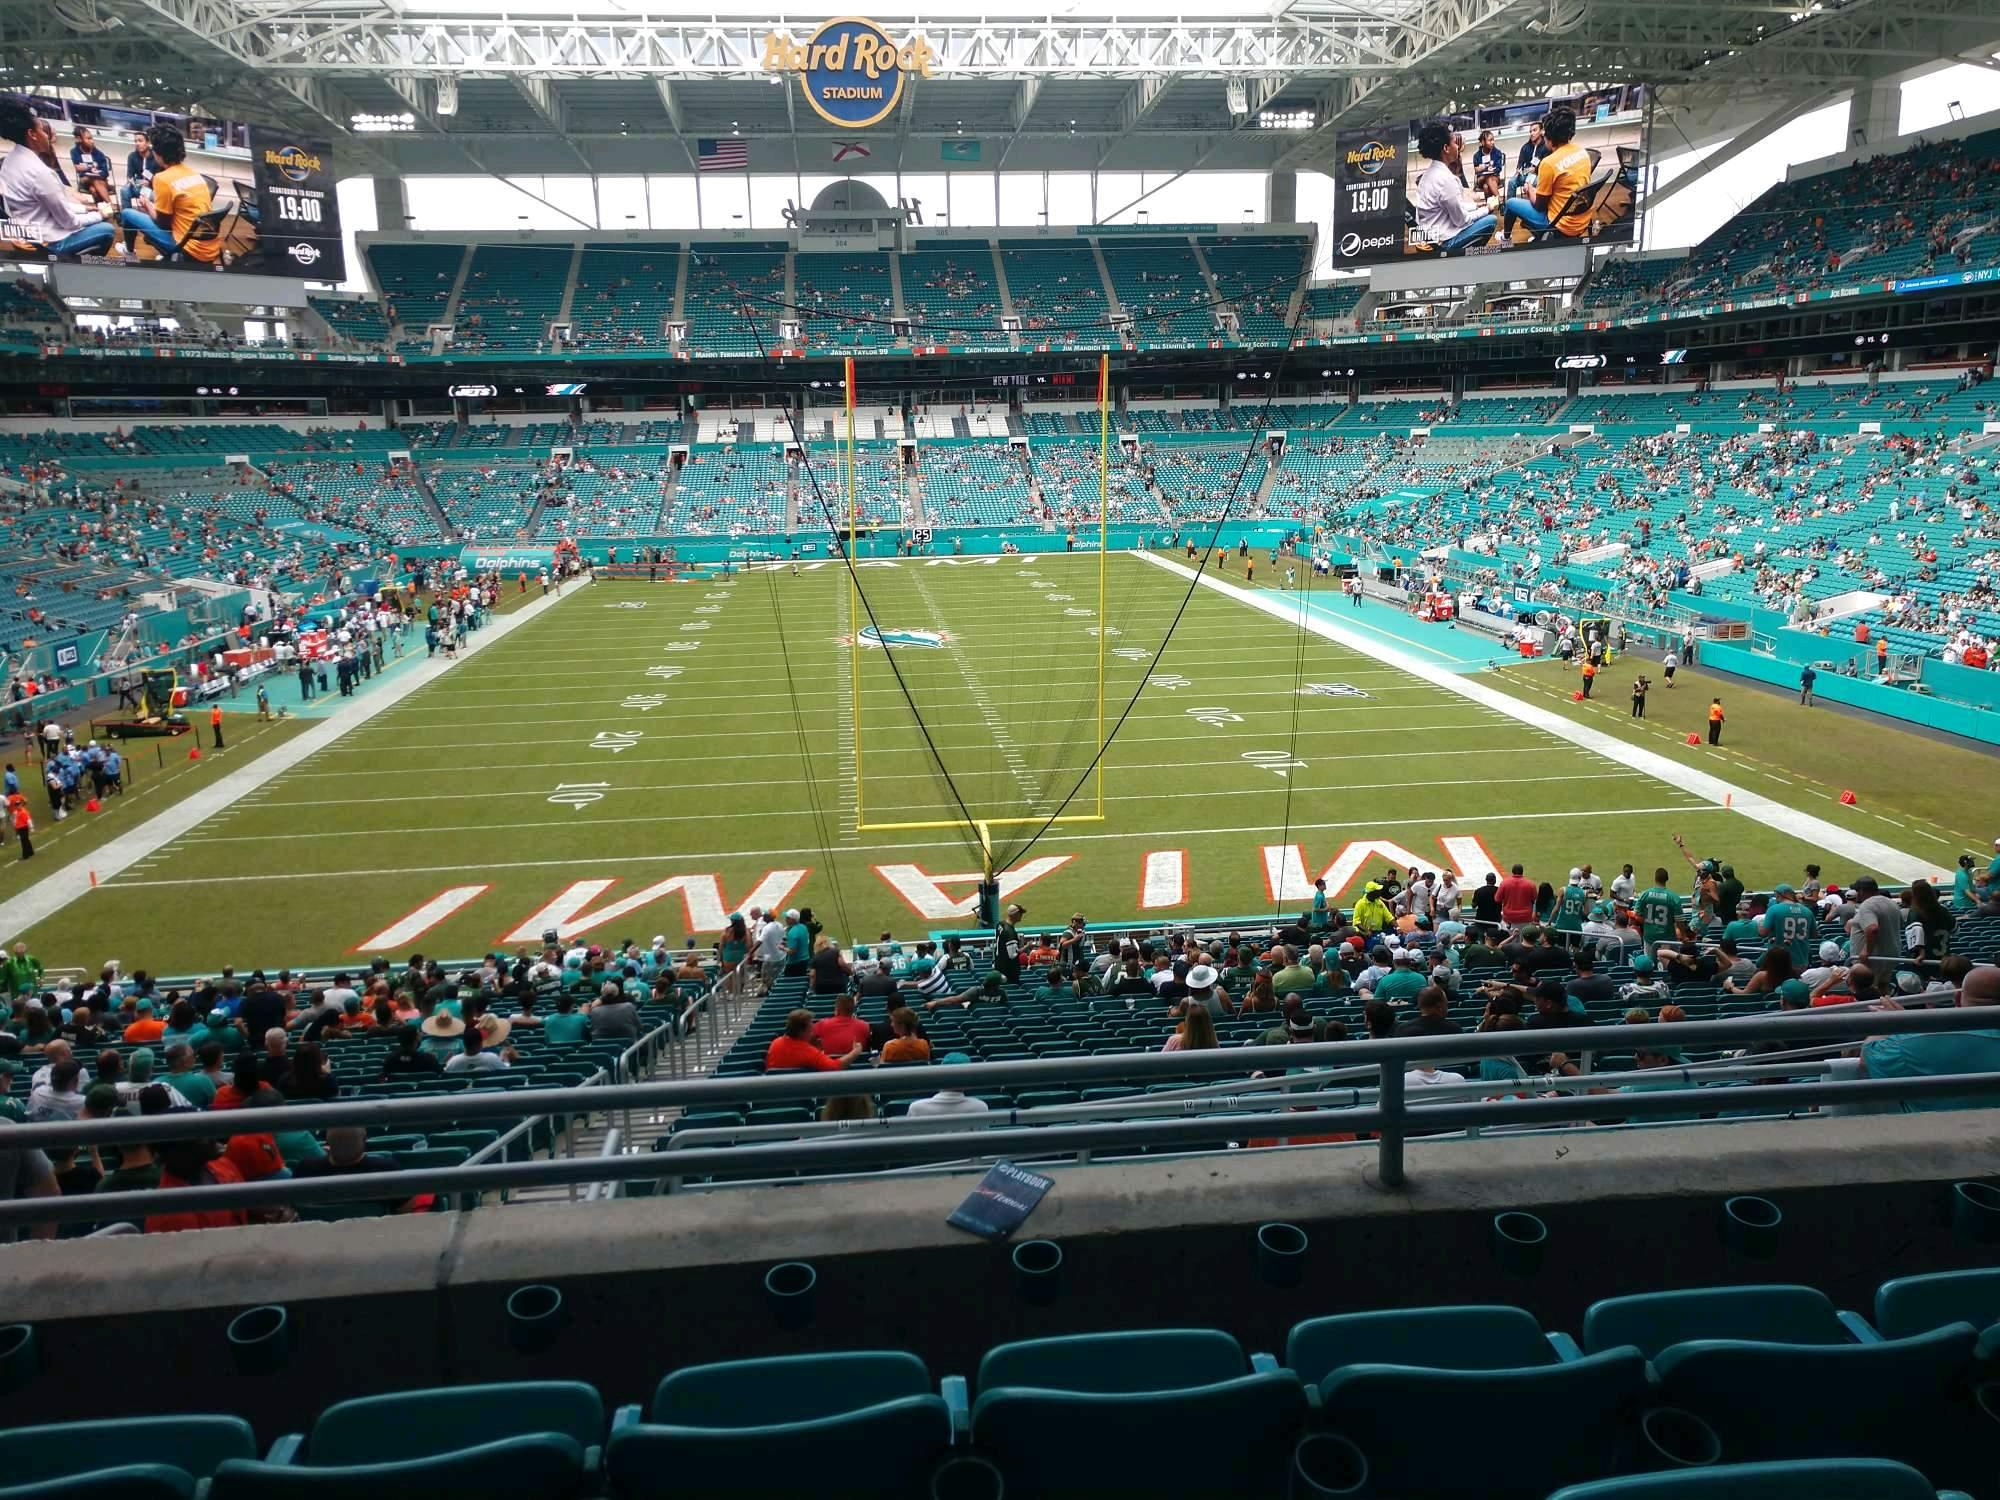 Hard Rock Stadium Section 232 Row 4 Seat 21